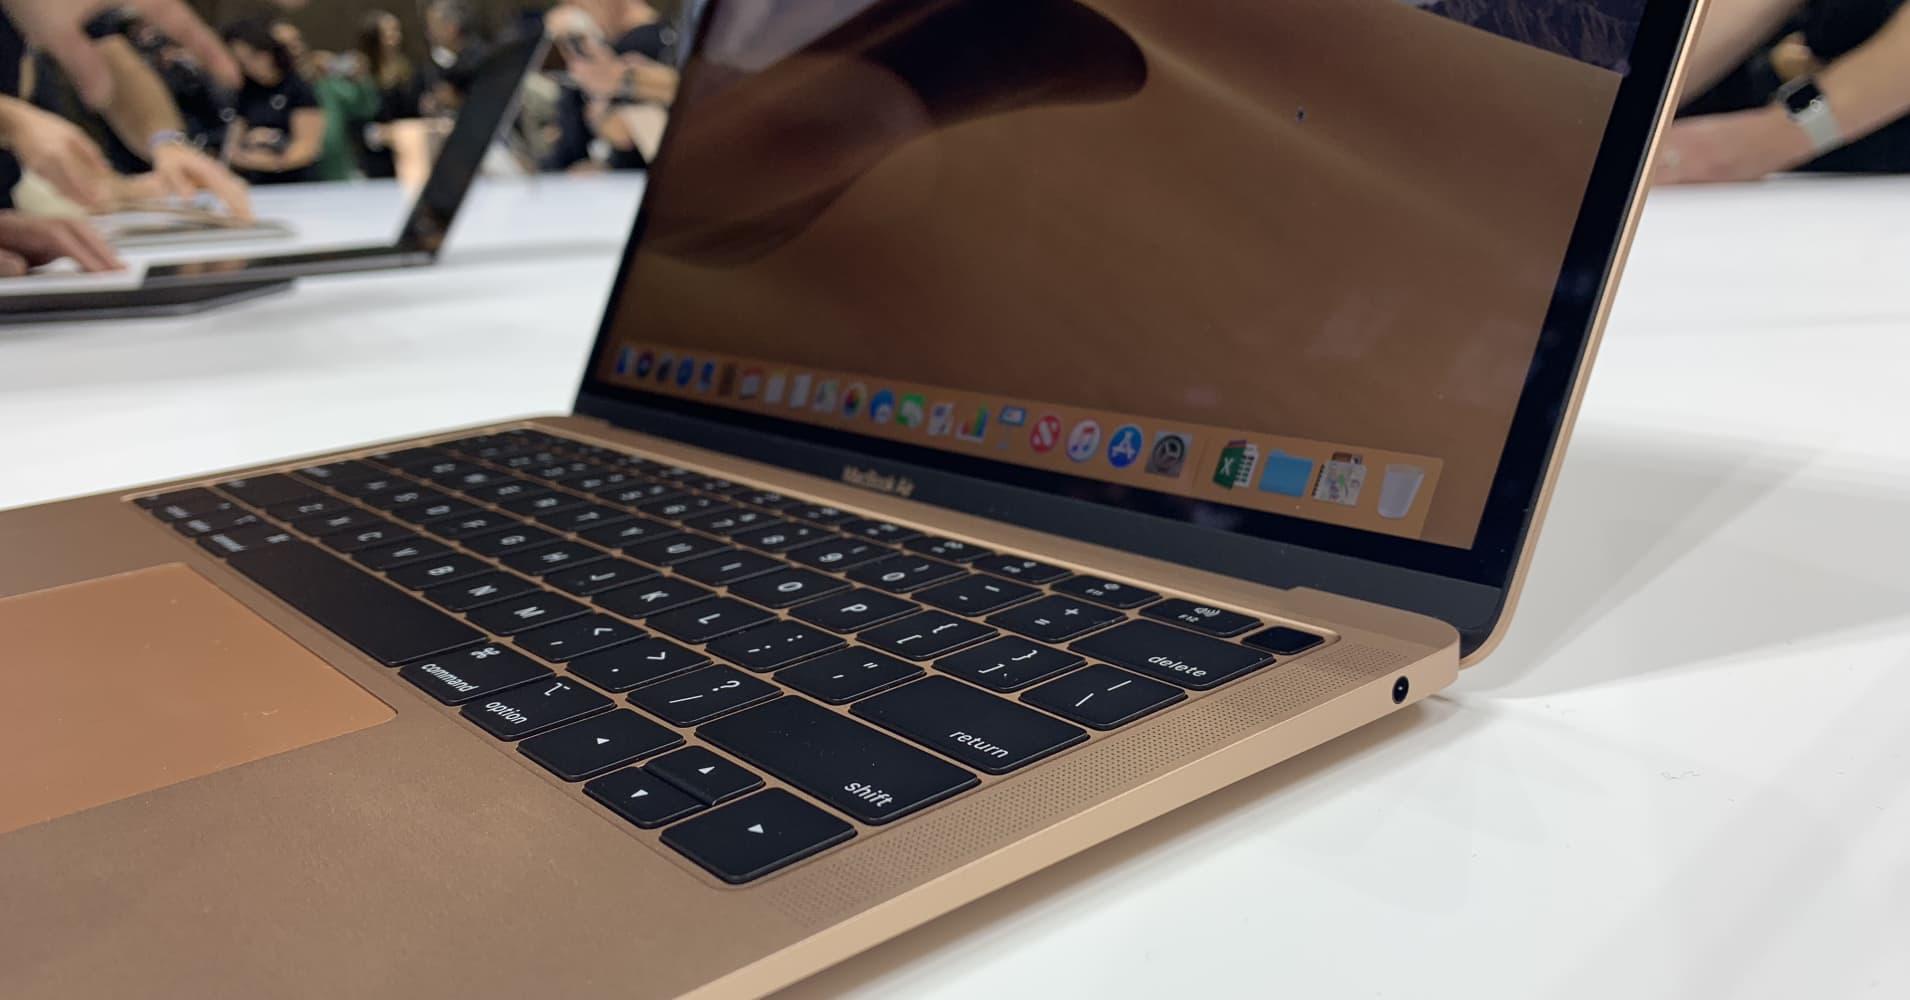 Macbook Air First Impressions